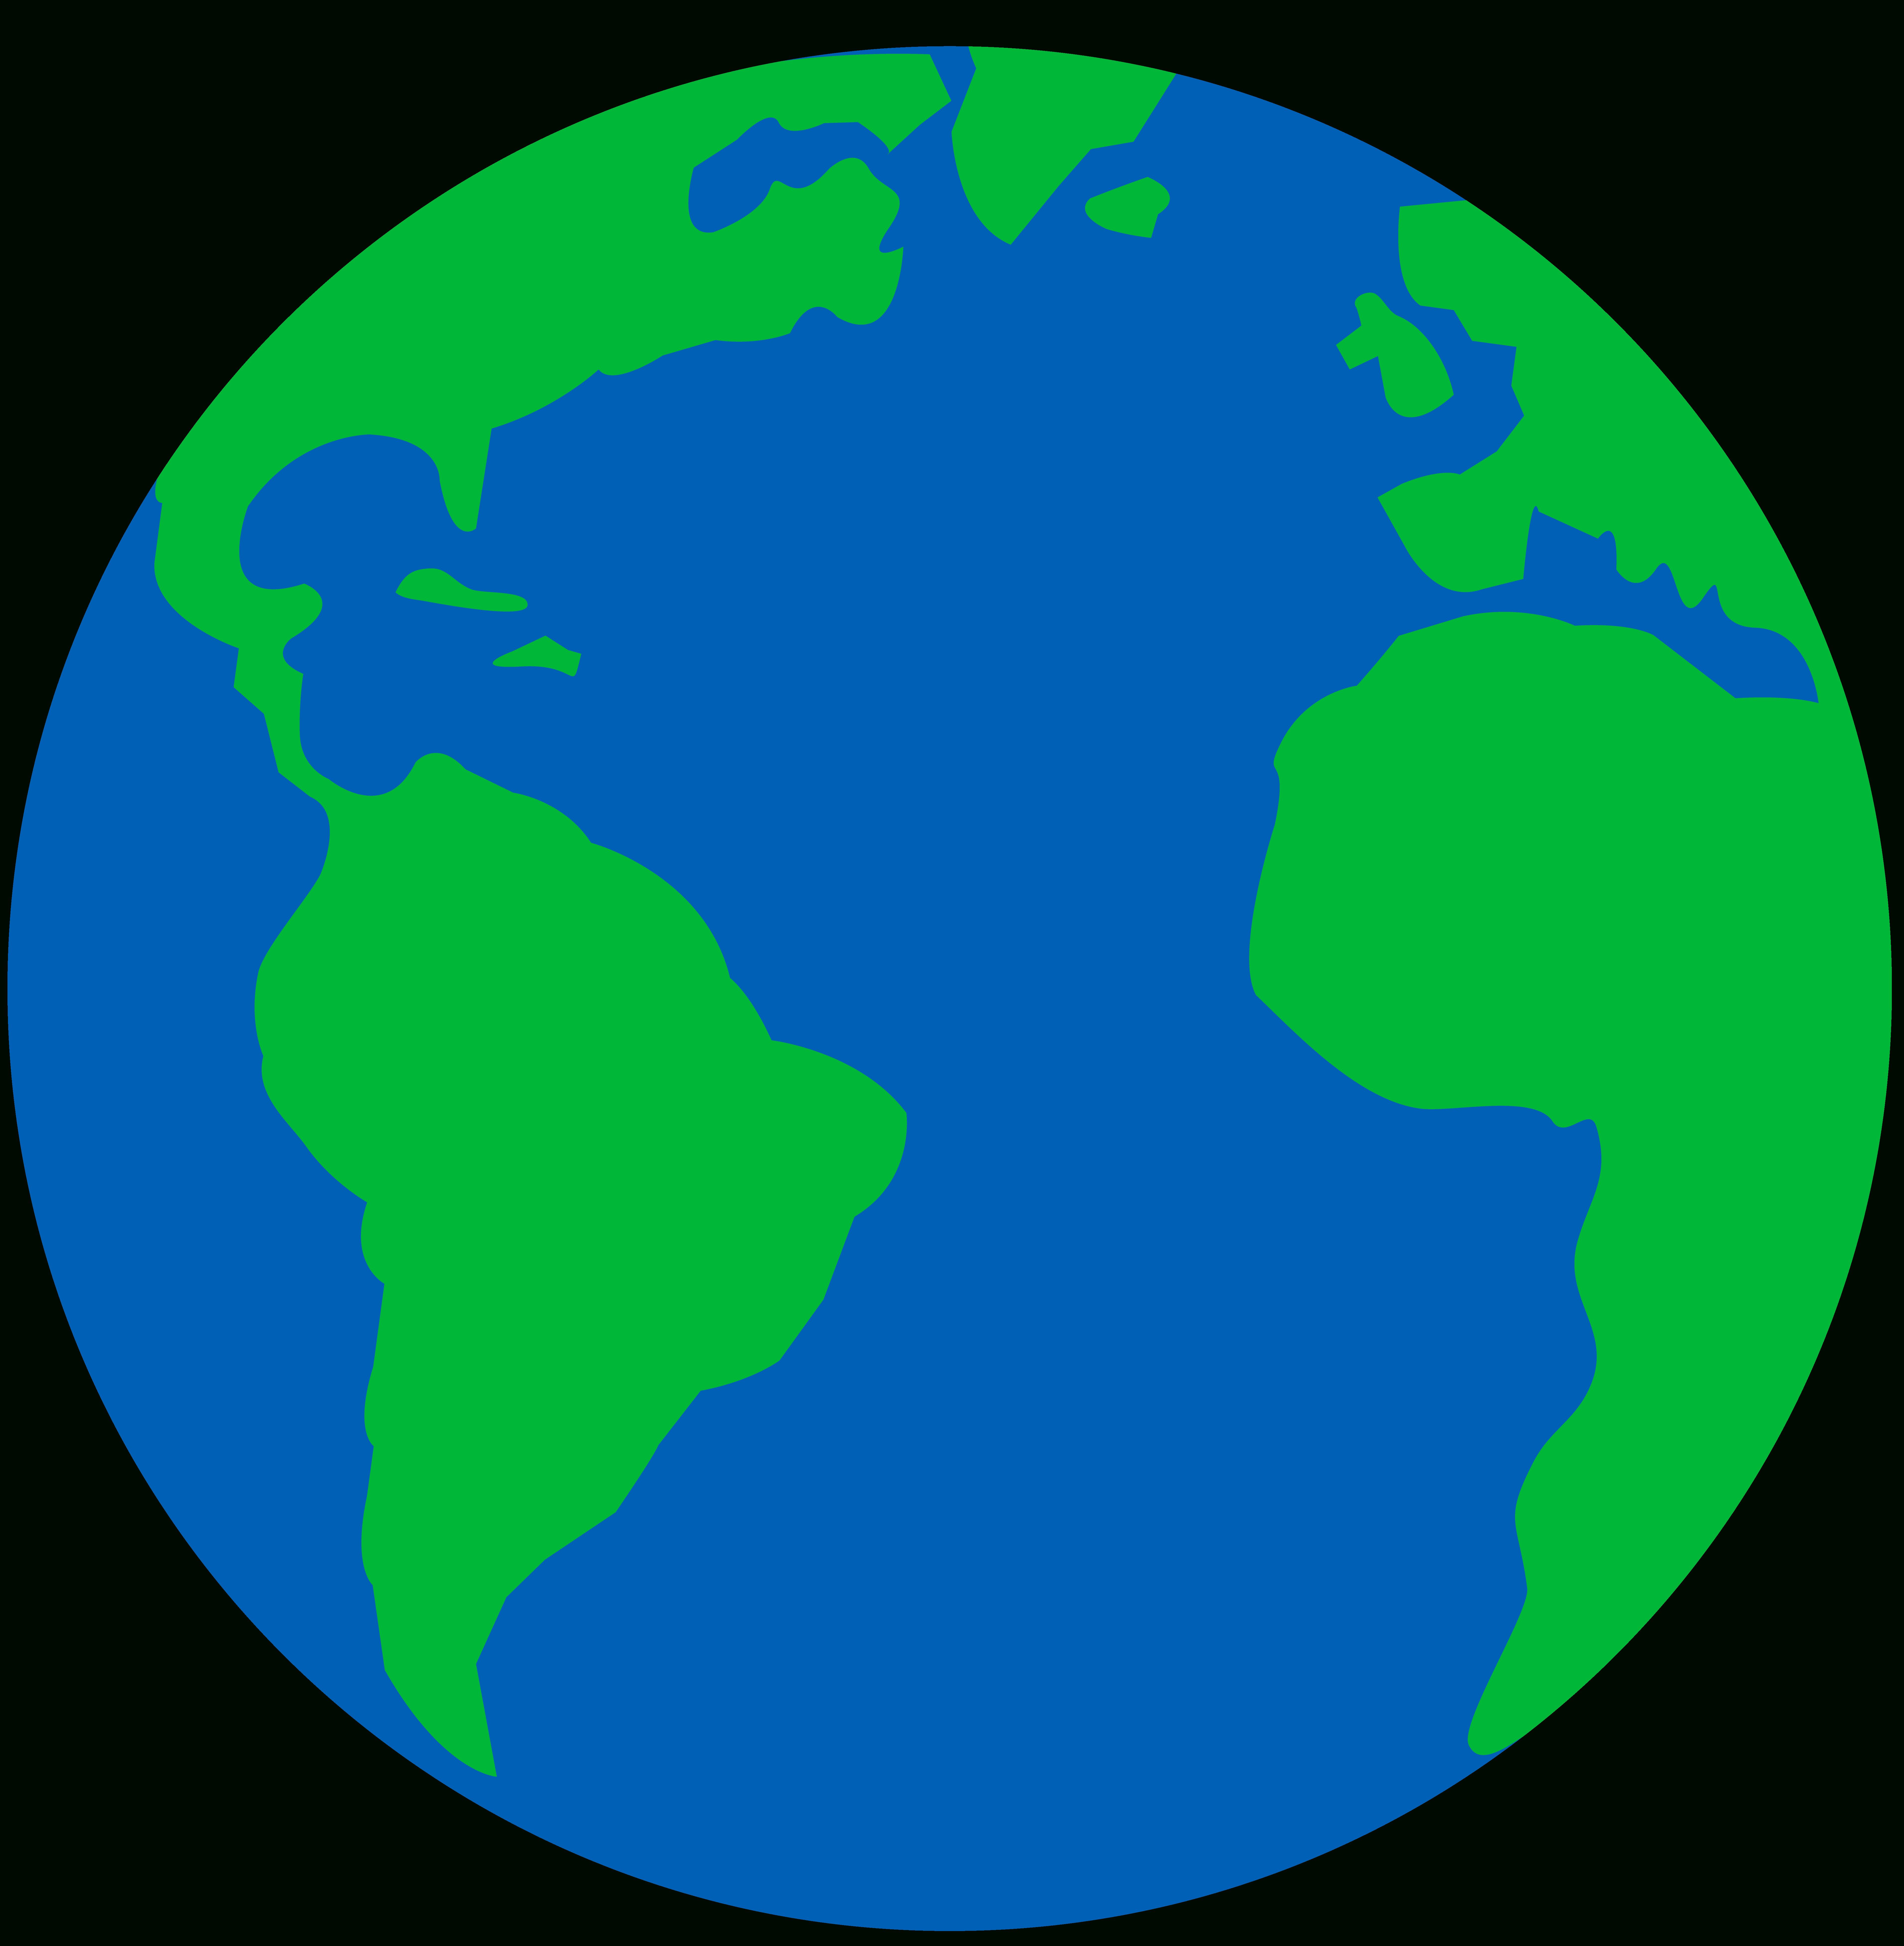 cartoon drawing of earth at getdrawings com free for personal use rh getdrawings com cartoon of birthday cake cartoon of the earth